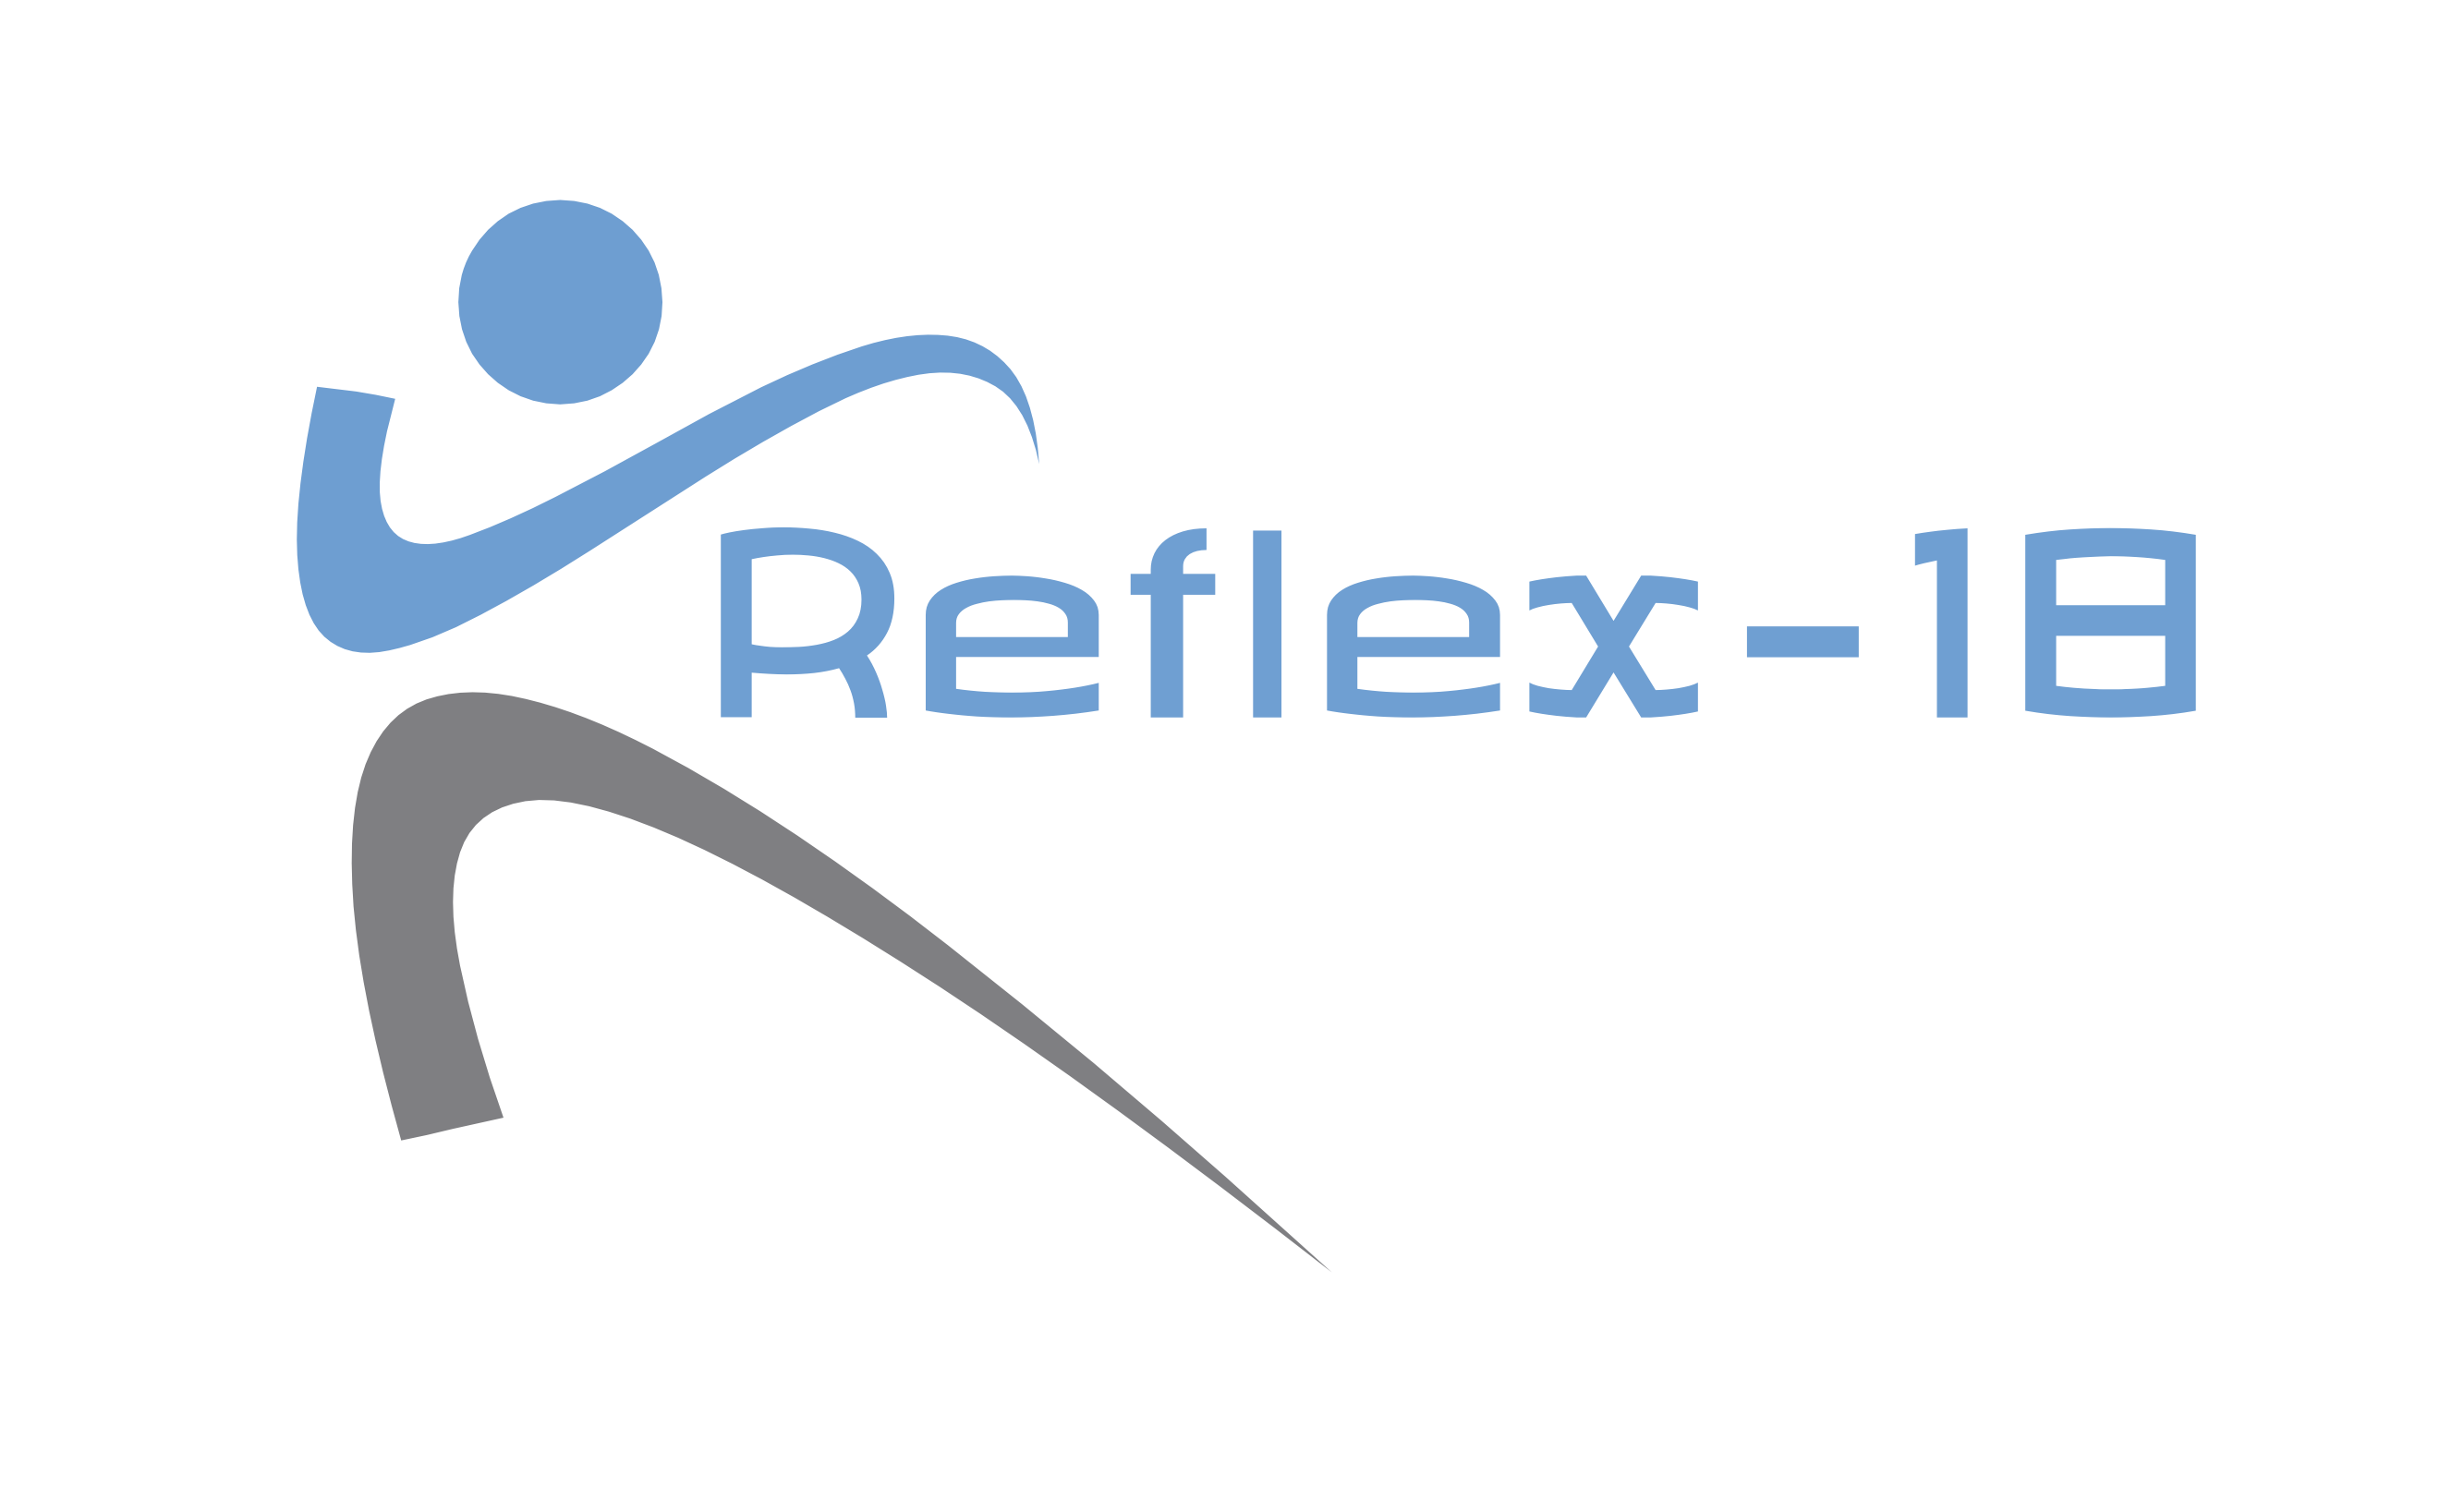 Reflex-18 company logo